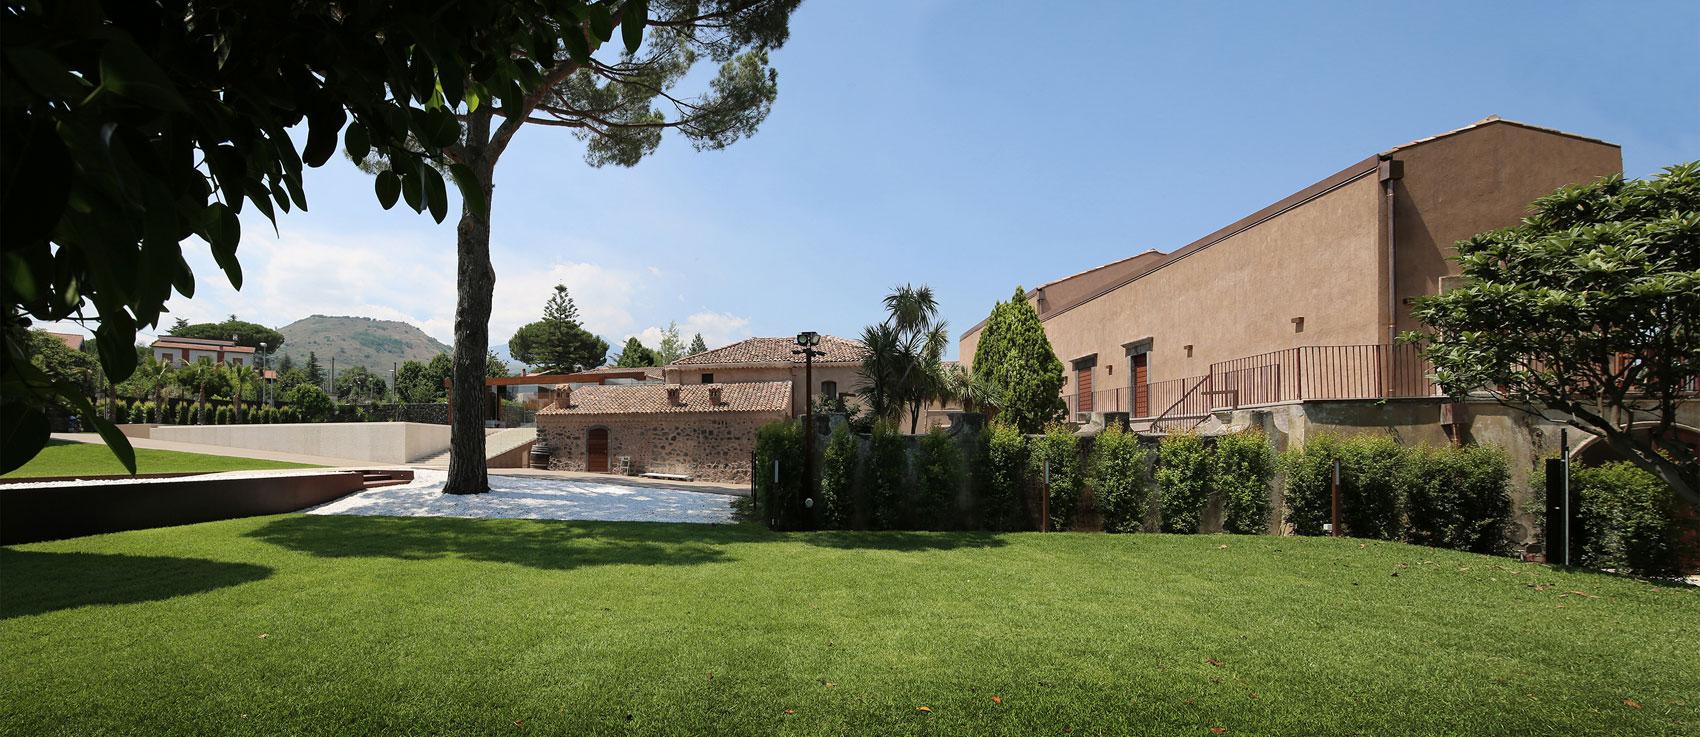 CRV House in Viagrande by ACA Amore Campione Architettura-01